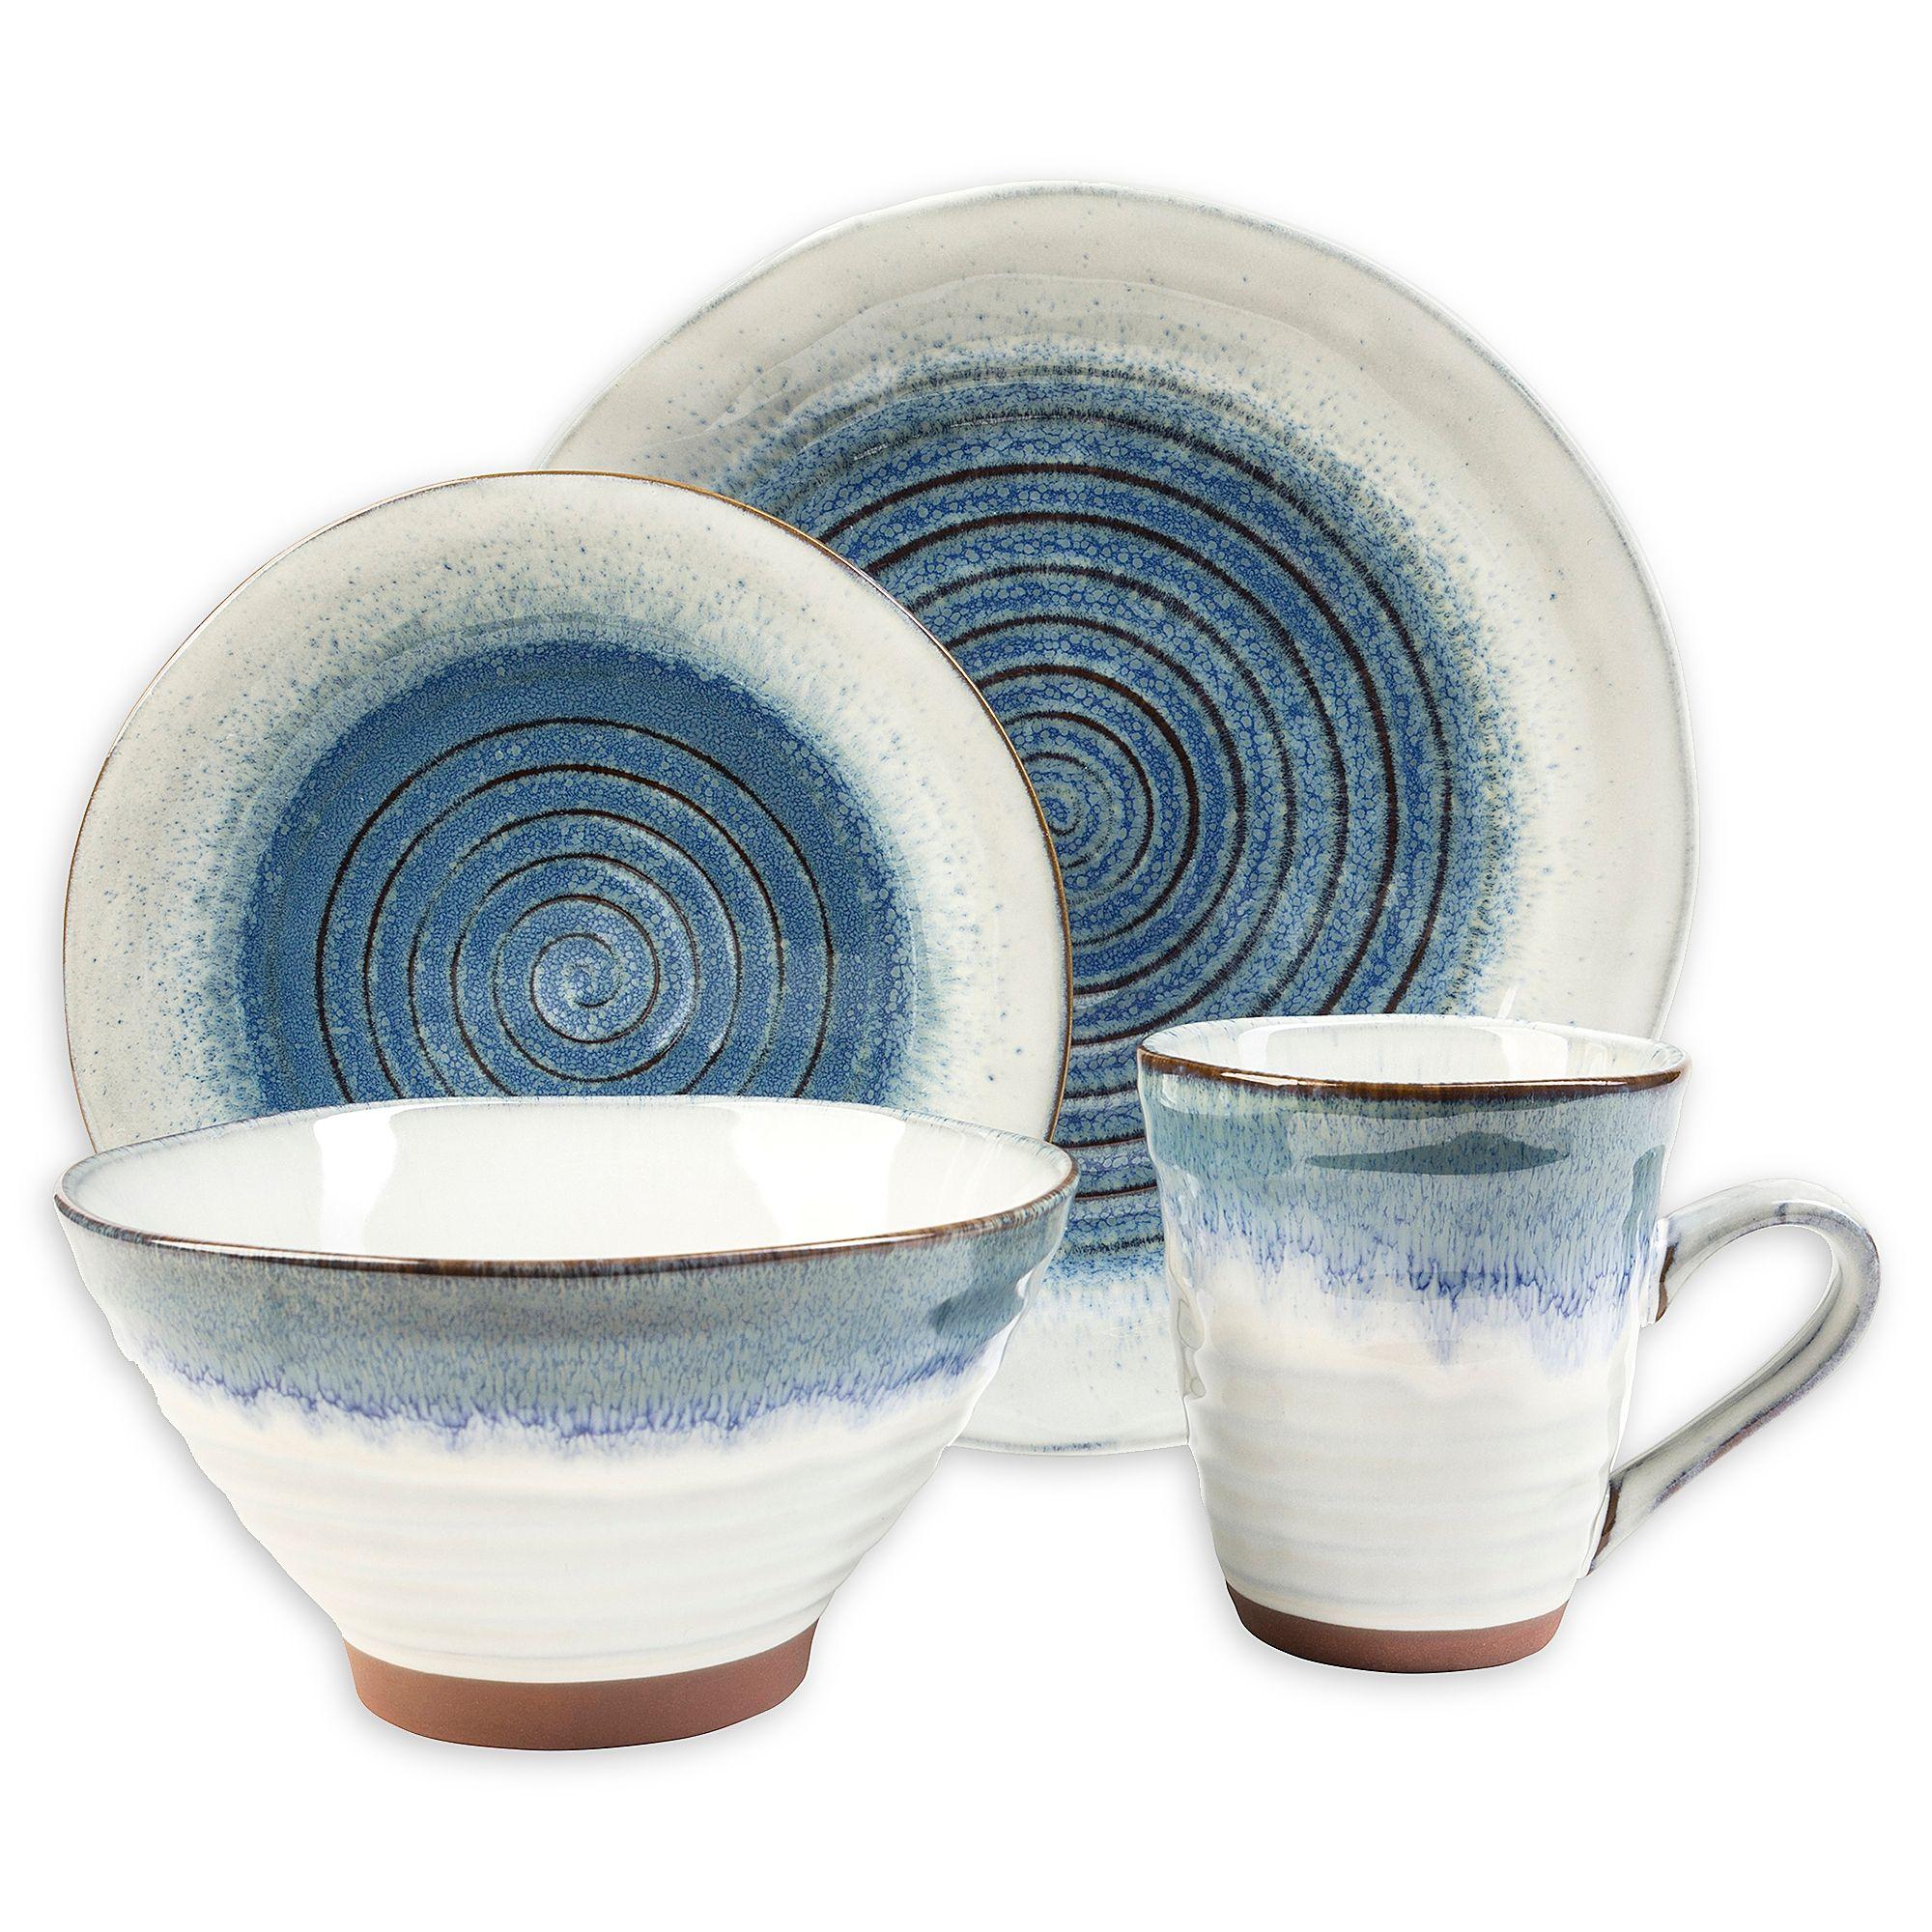 Sango Talia 16 Piece Dinnerware Set In Blue Bed Bath Beyond Stoneware Dinnerware Sets Blue Dinnerware Sets Blue Dinnerware